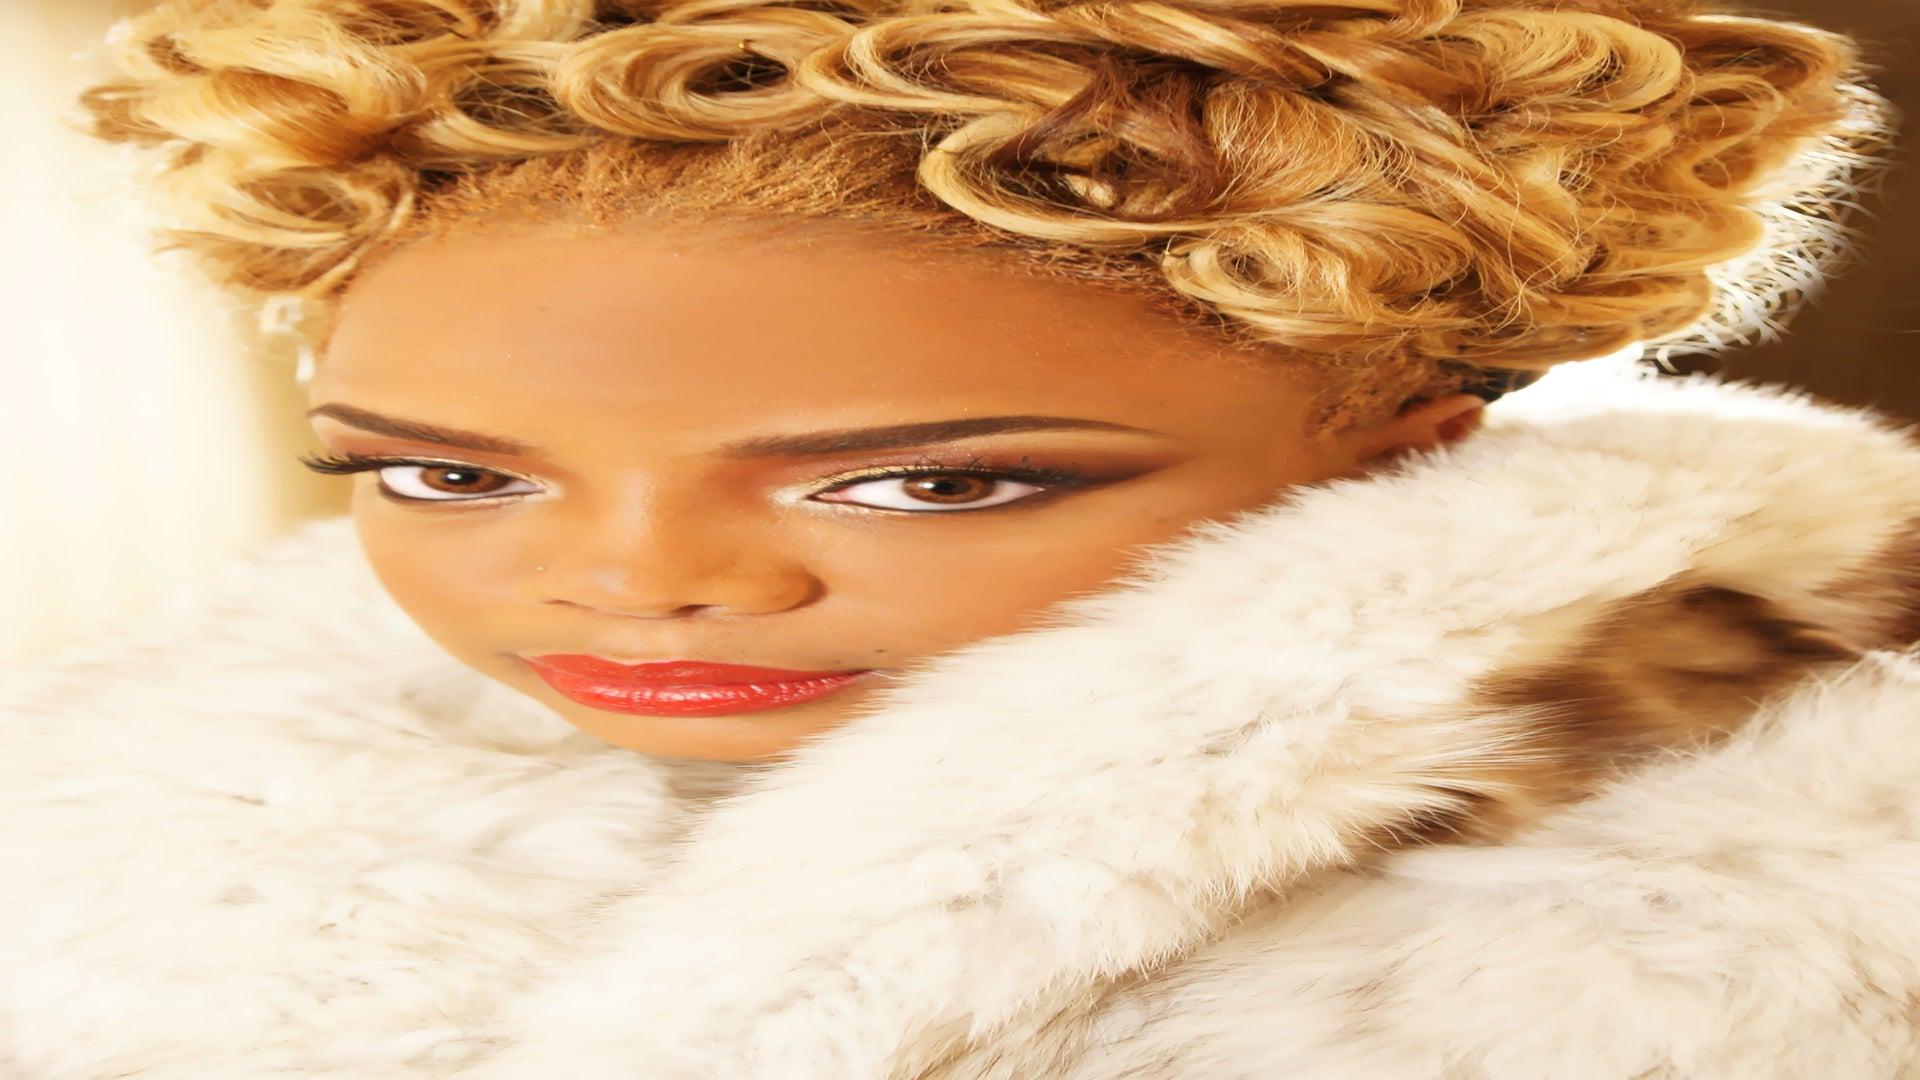 EXCLUSIVE: Leela James Talks New Album and Honoring Etta James